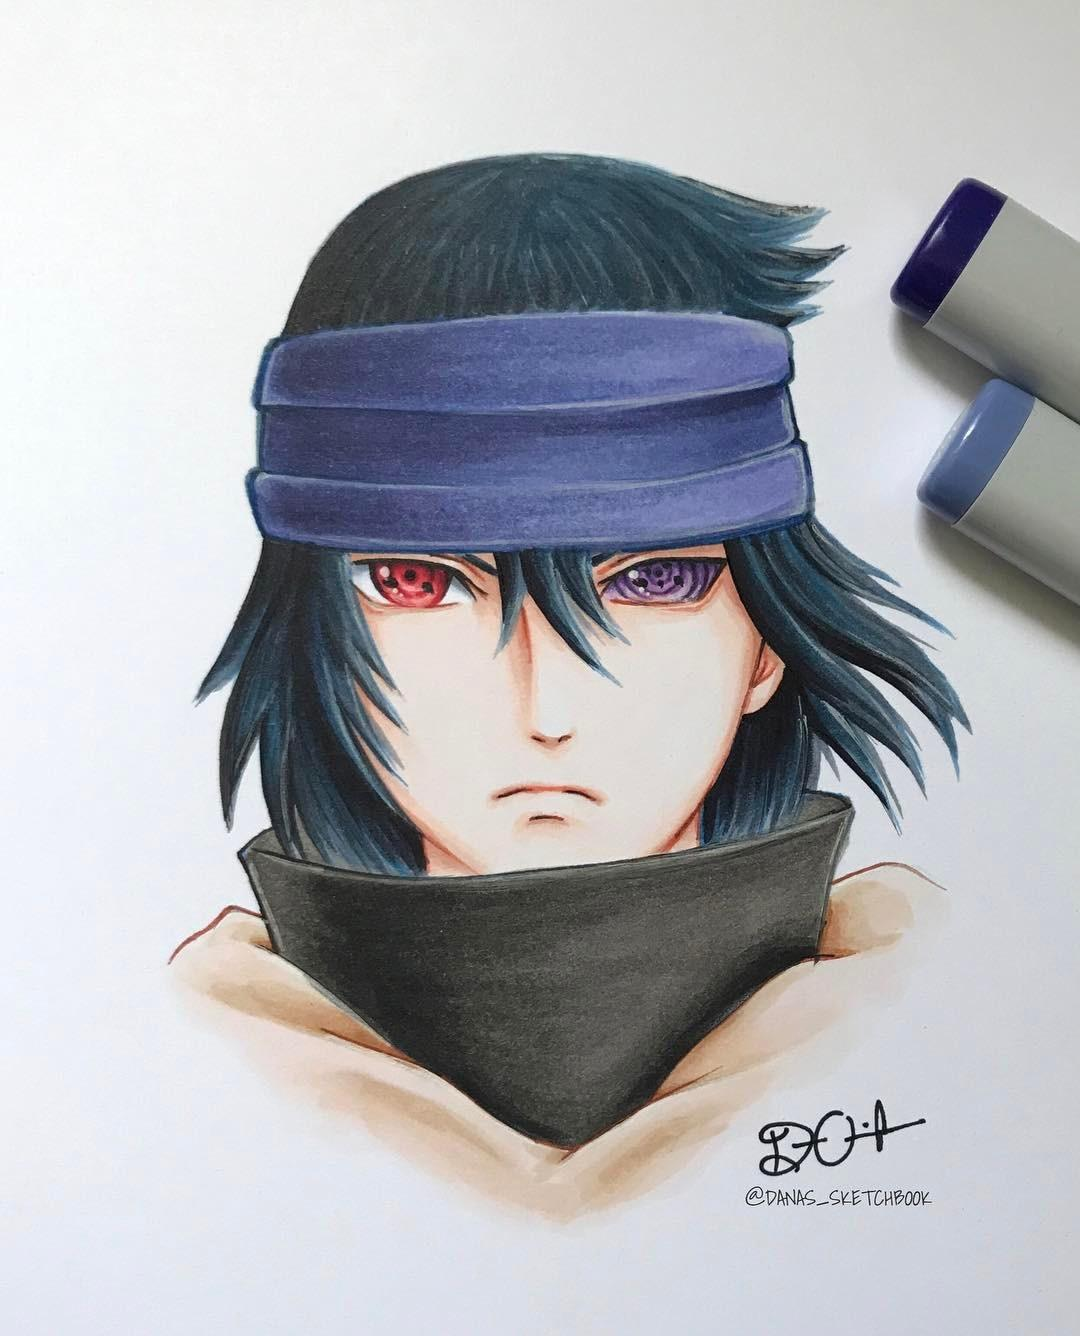 1080x1336 Sasuke The Last Drawing By Danas Sketchbook Via Instagram Naruto